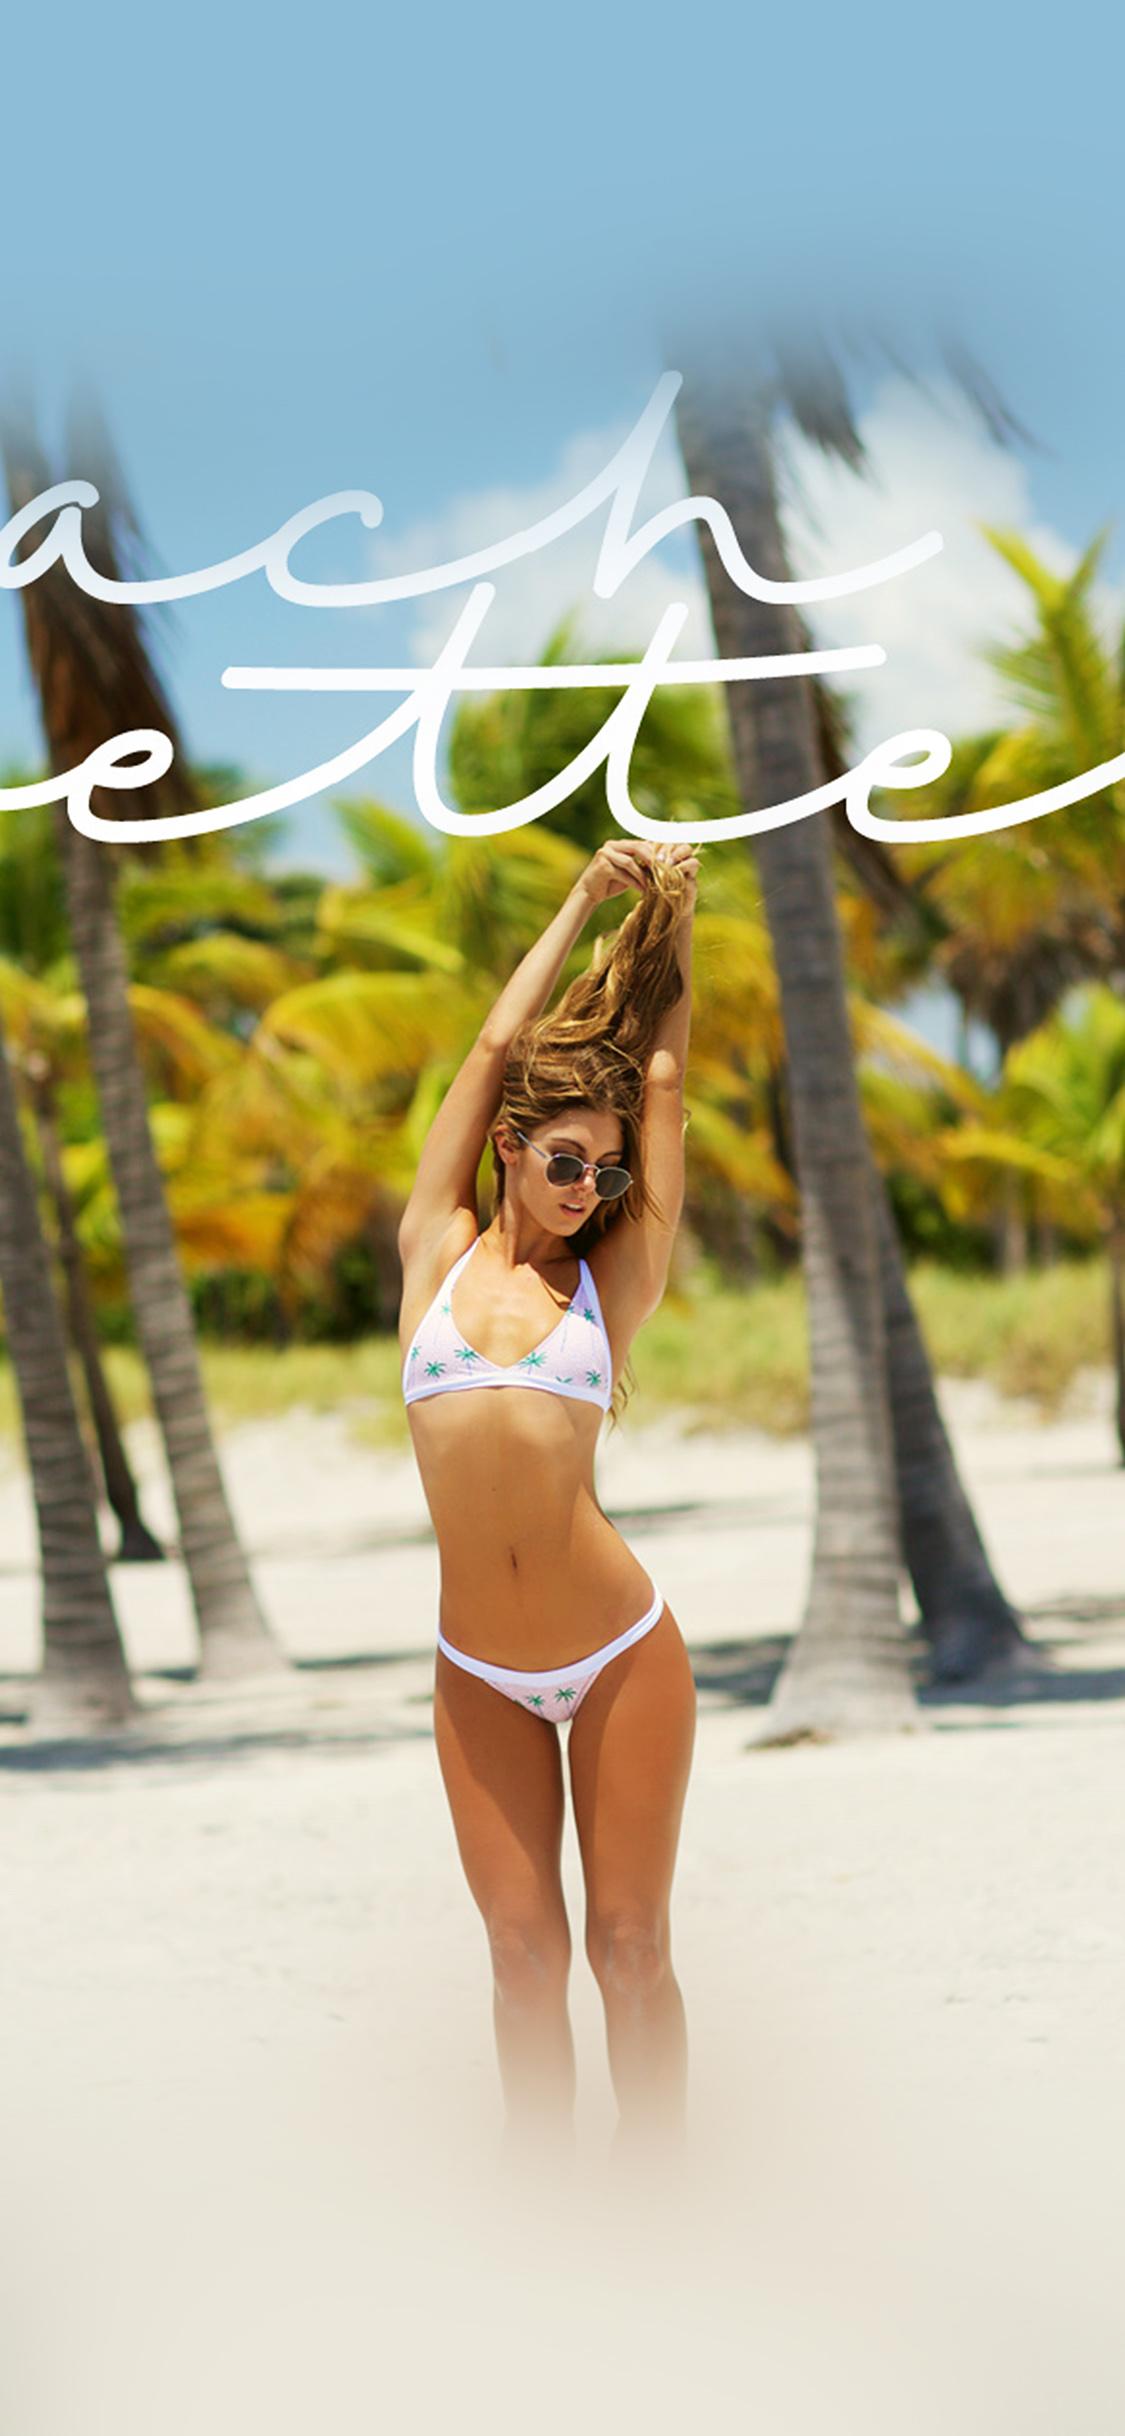 iPhoneXpapers.com-Apple-iPhone-wallpaper-hj84-beach-girl-bikini-summer-cool